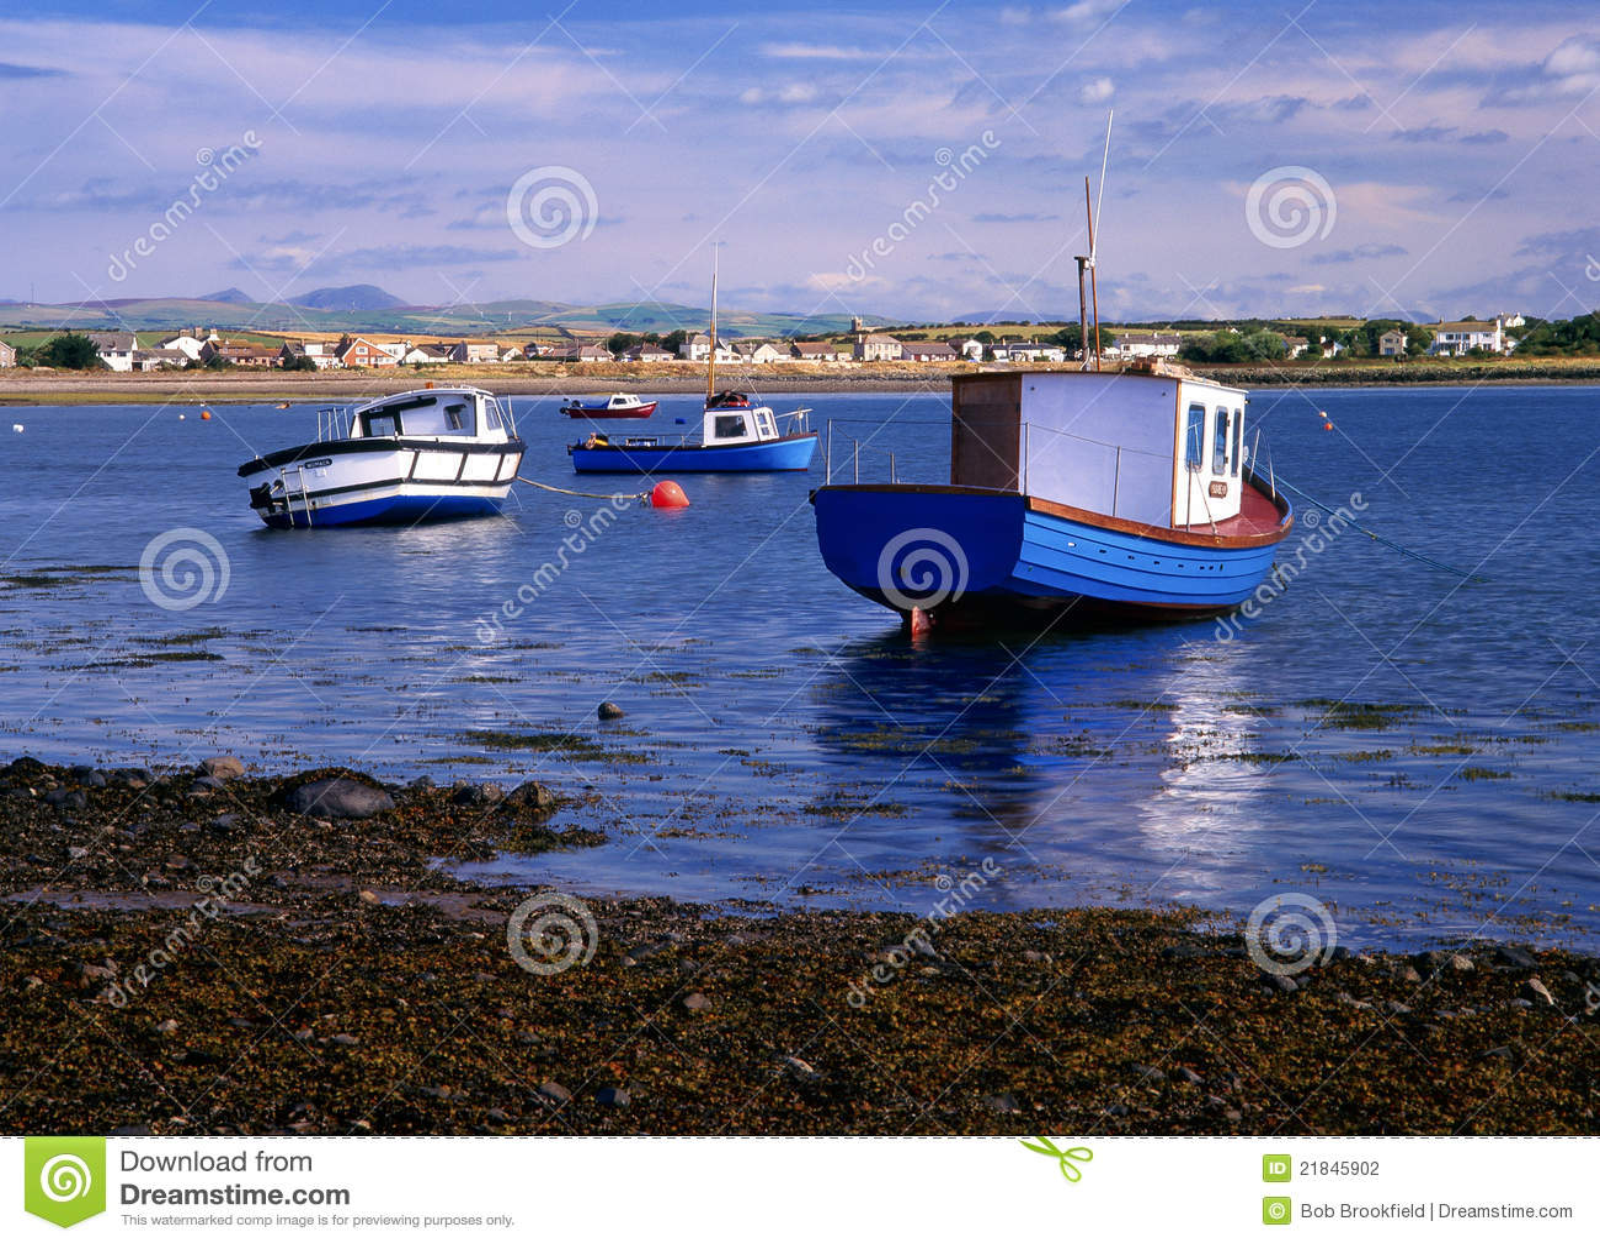 Roa Island, Cumbria, England Stock Photography